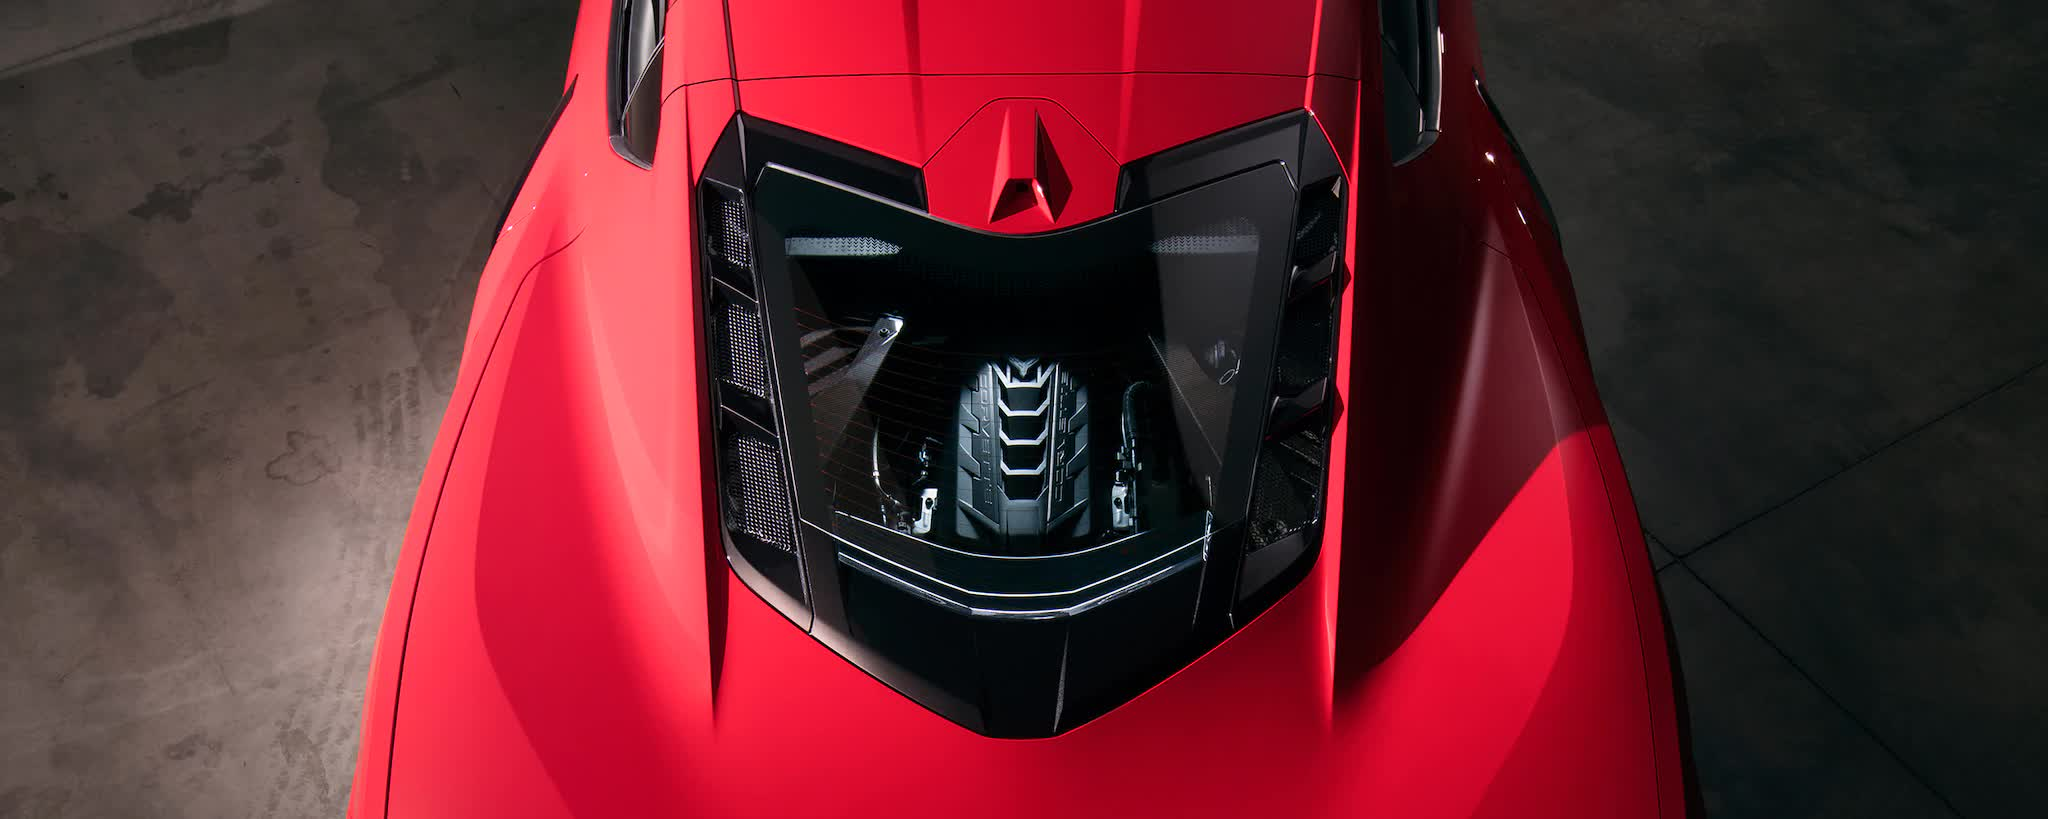 Tettuccio Corvette C8